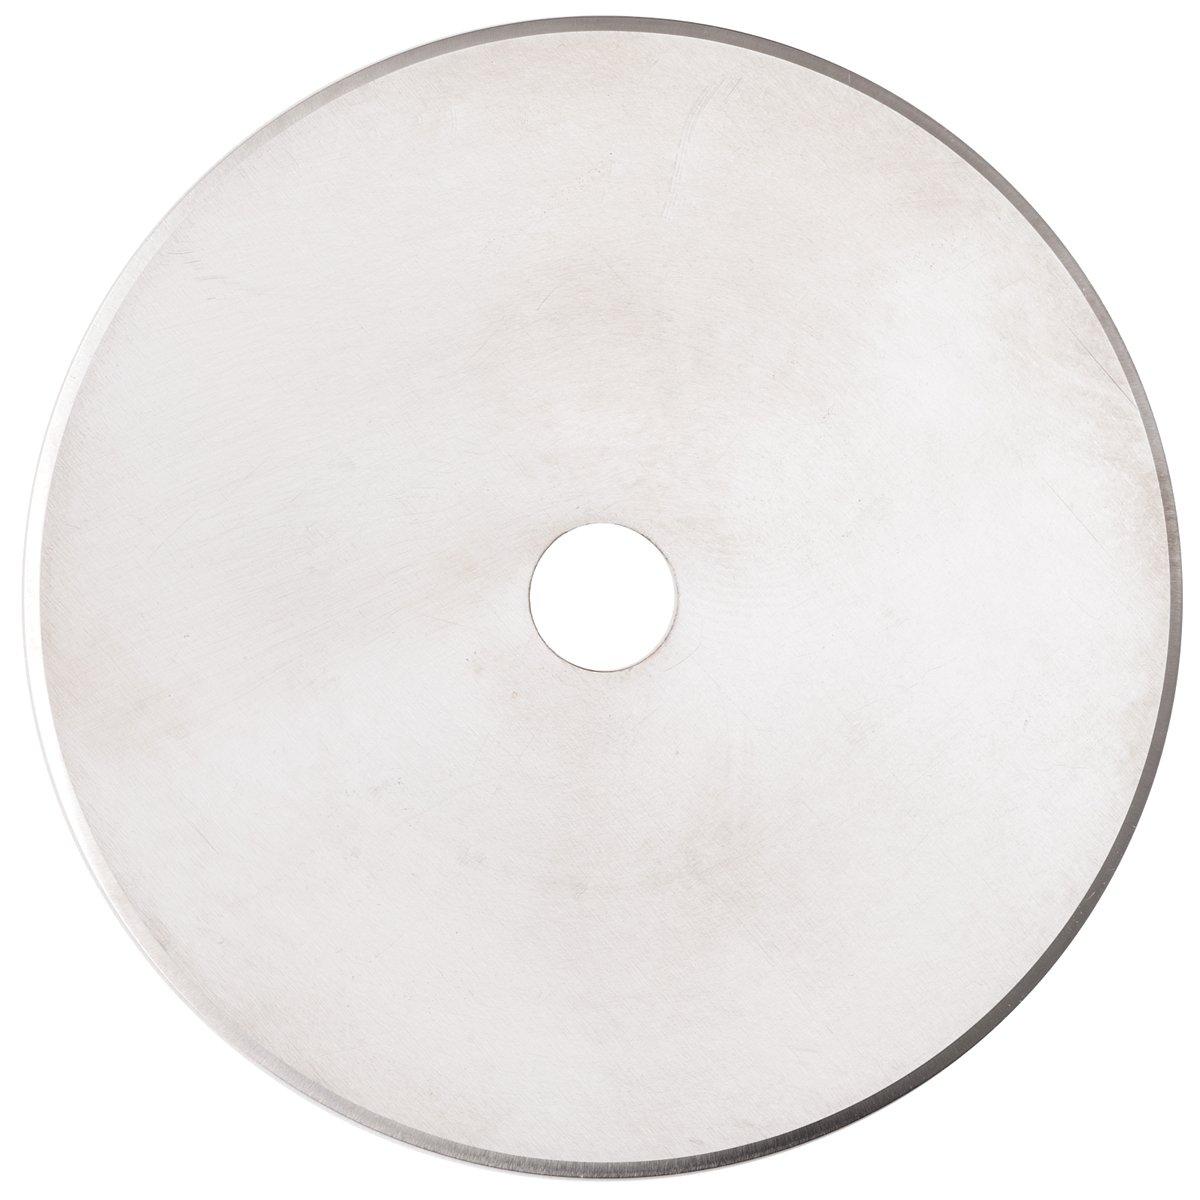 Fiskars 65mm Rotary Straight Blade (95467097)